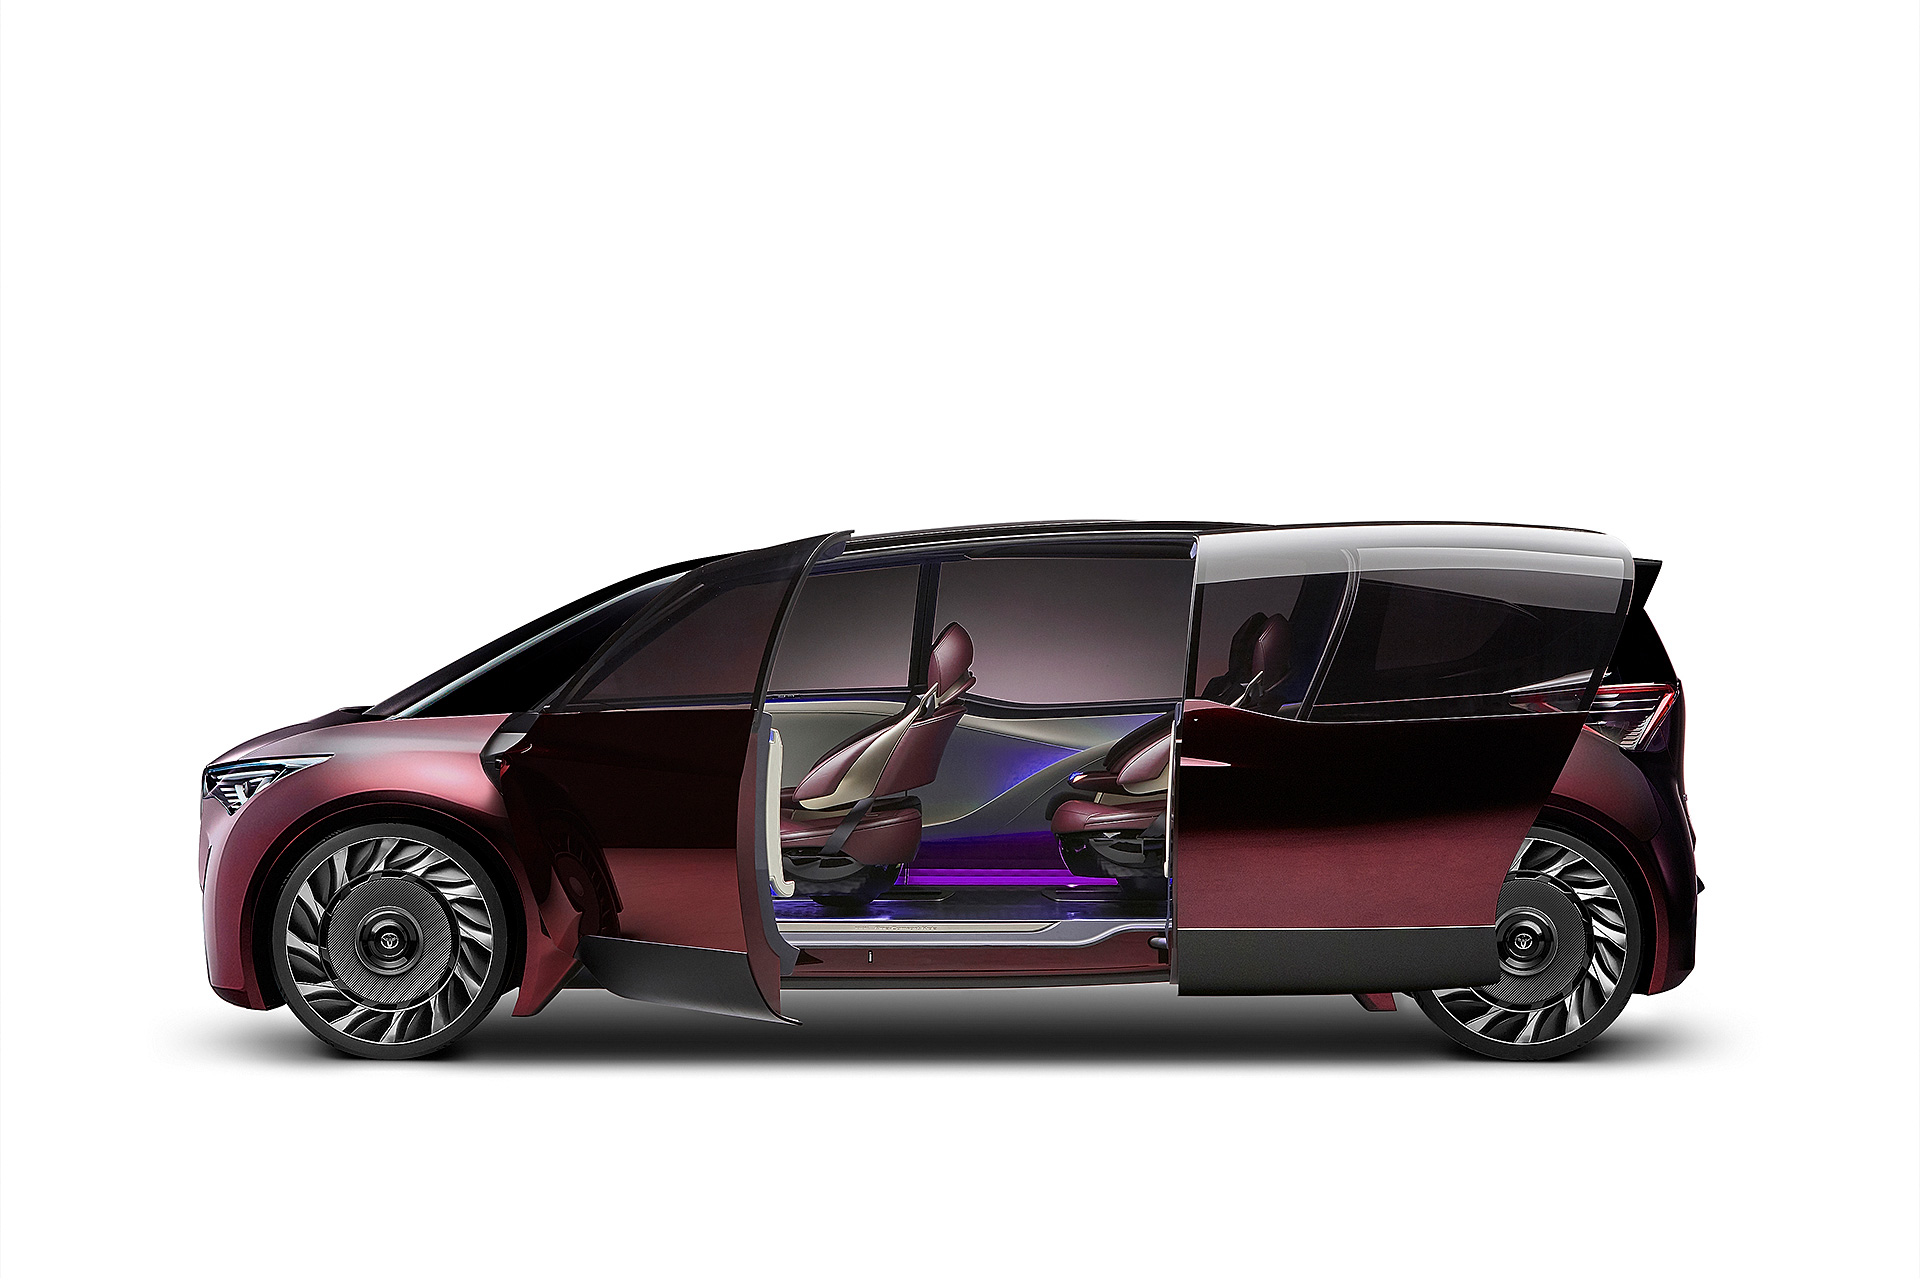 toyota yakıt hücreli konsept otomobil